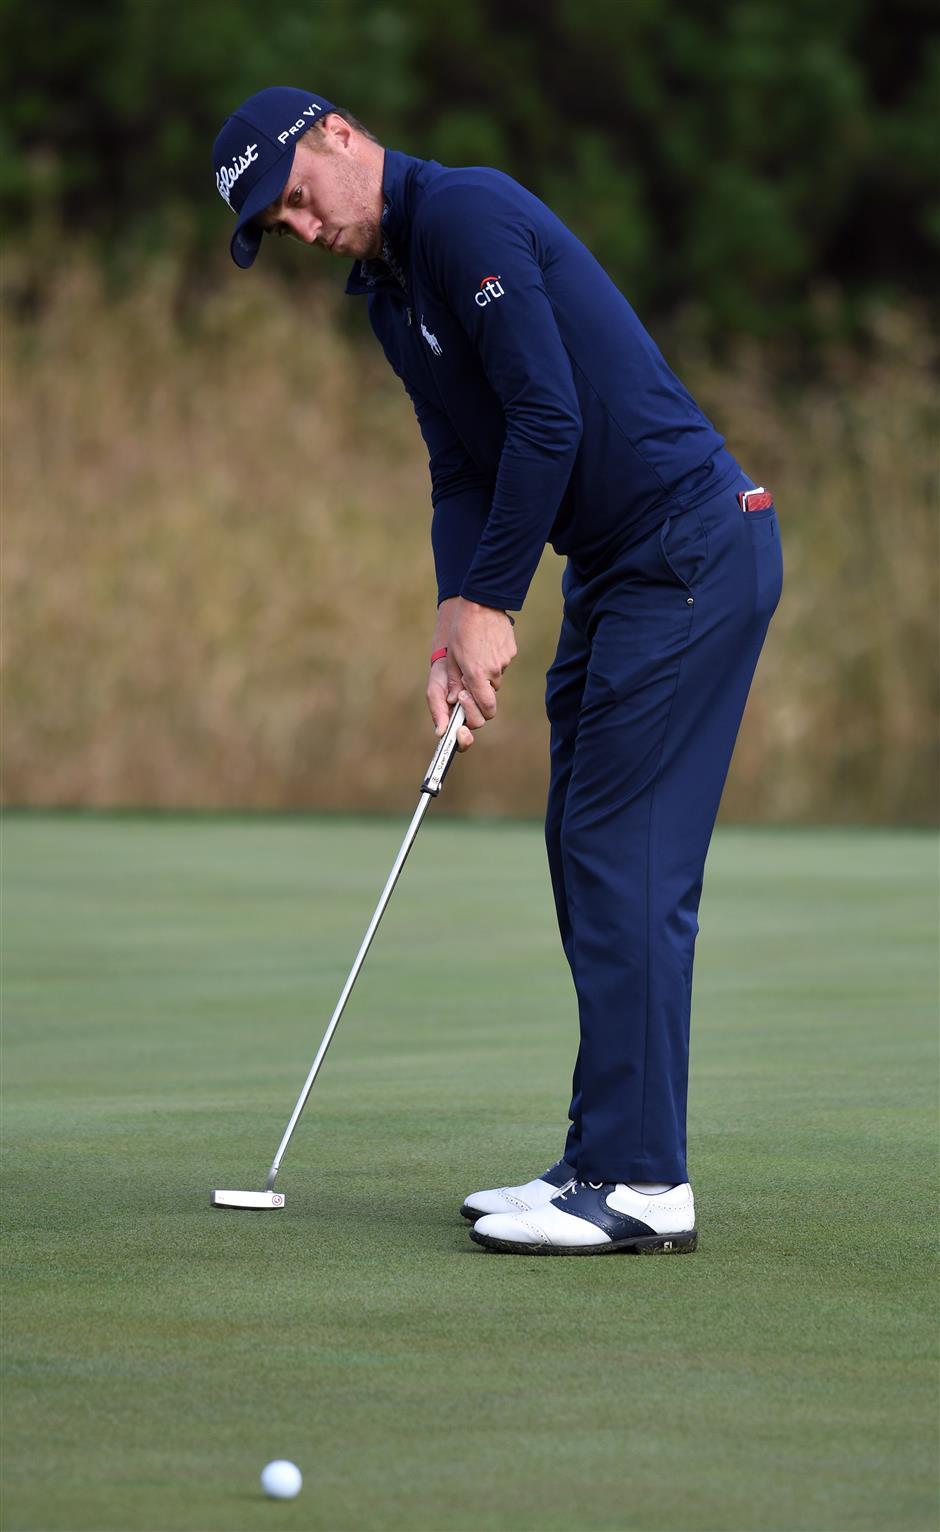 Thomas surges 3 shots clear as PGA Tour makes Korea debut